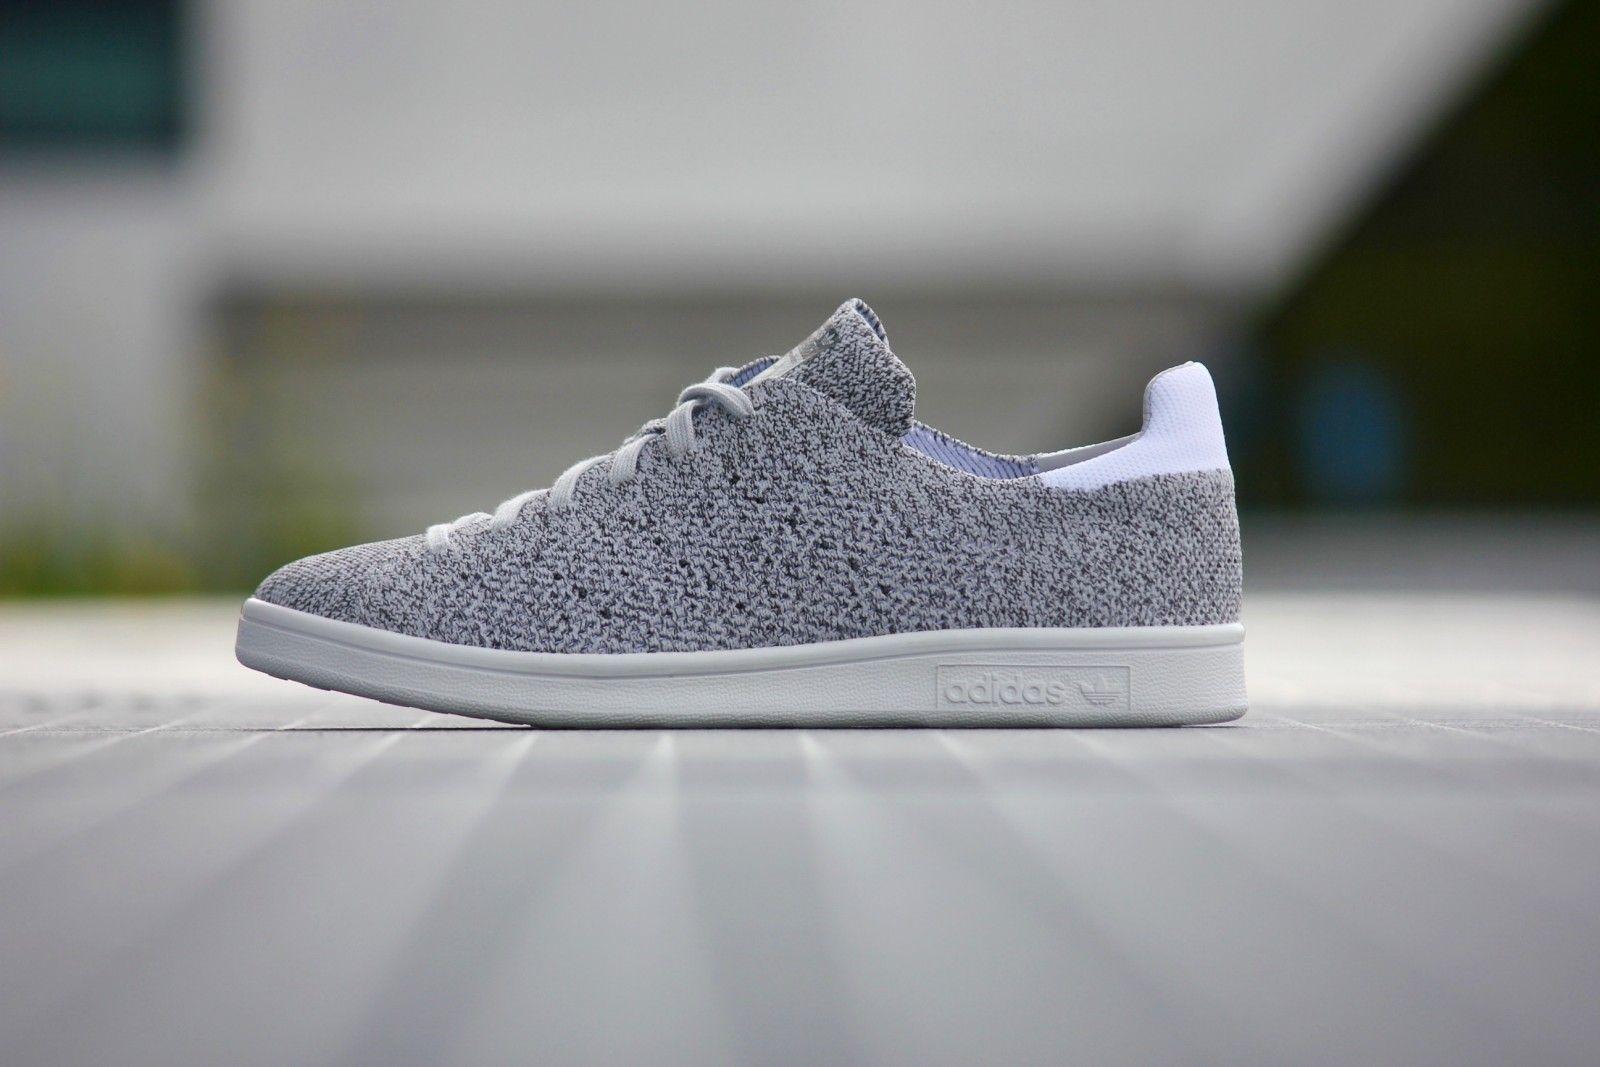 huge selection of 03caa 70334 Adidas Stan Smith Primeknit NM Grey - B27152